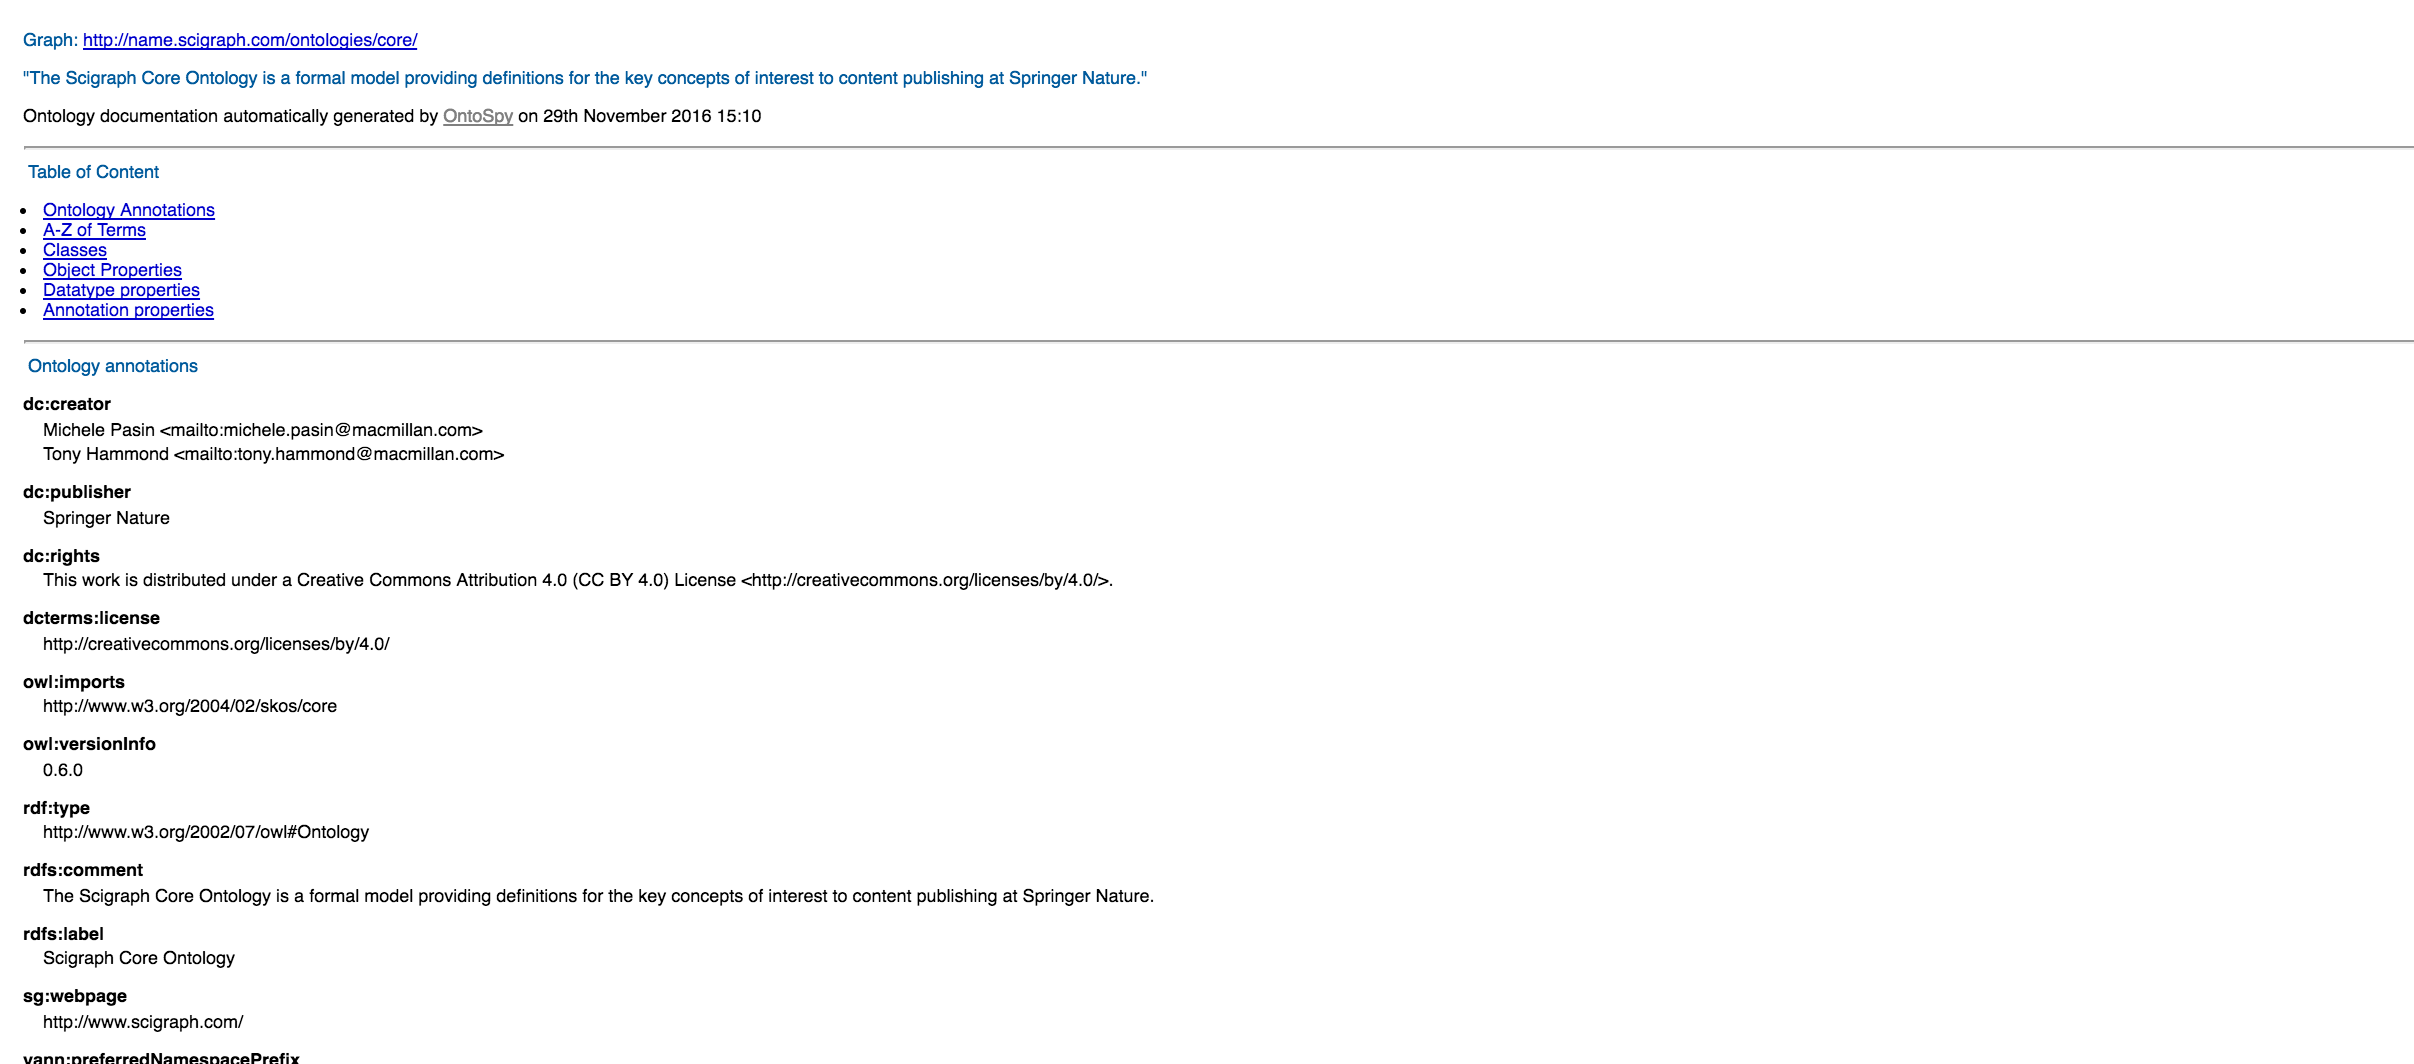 ontospy/ontodocs/media/static/img/screenshot-basic-html.png